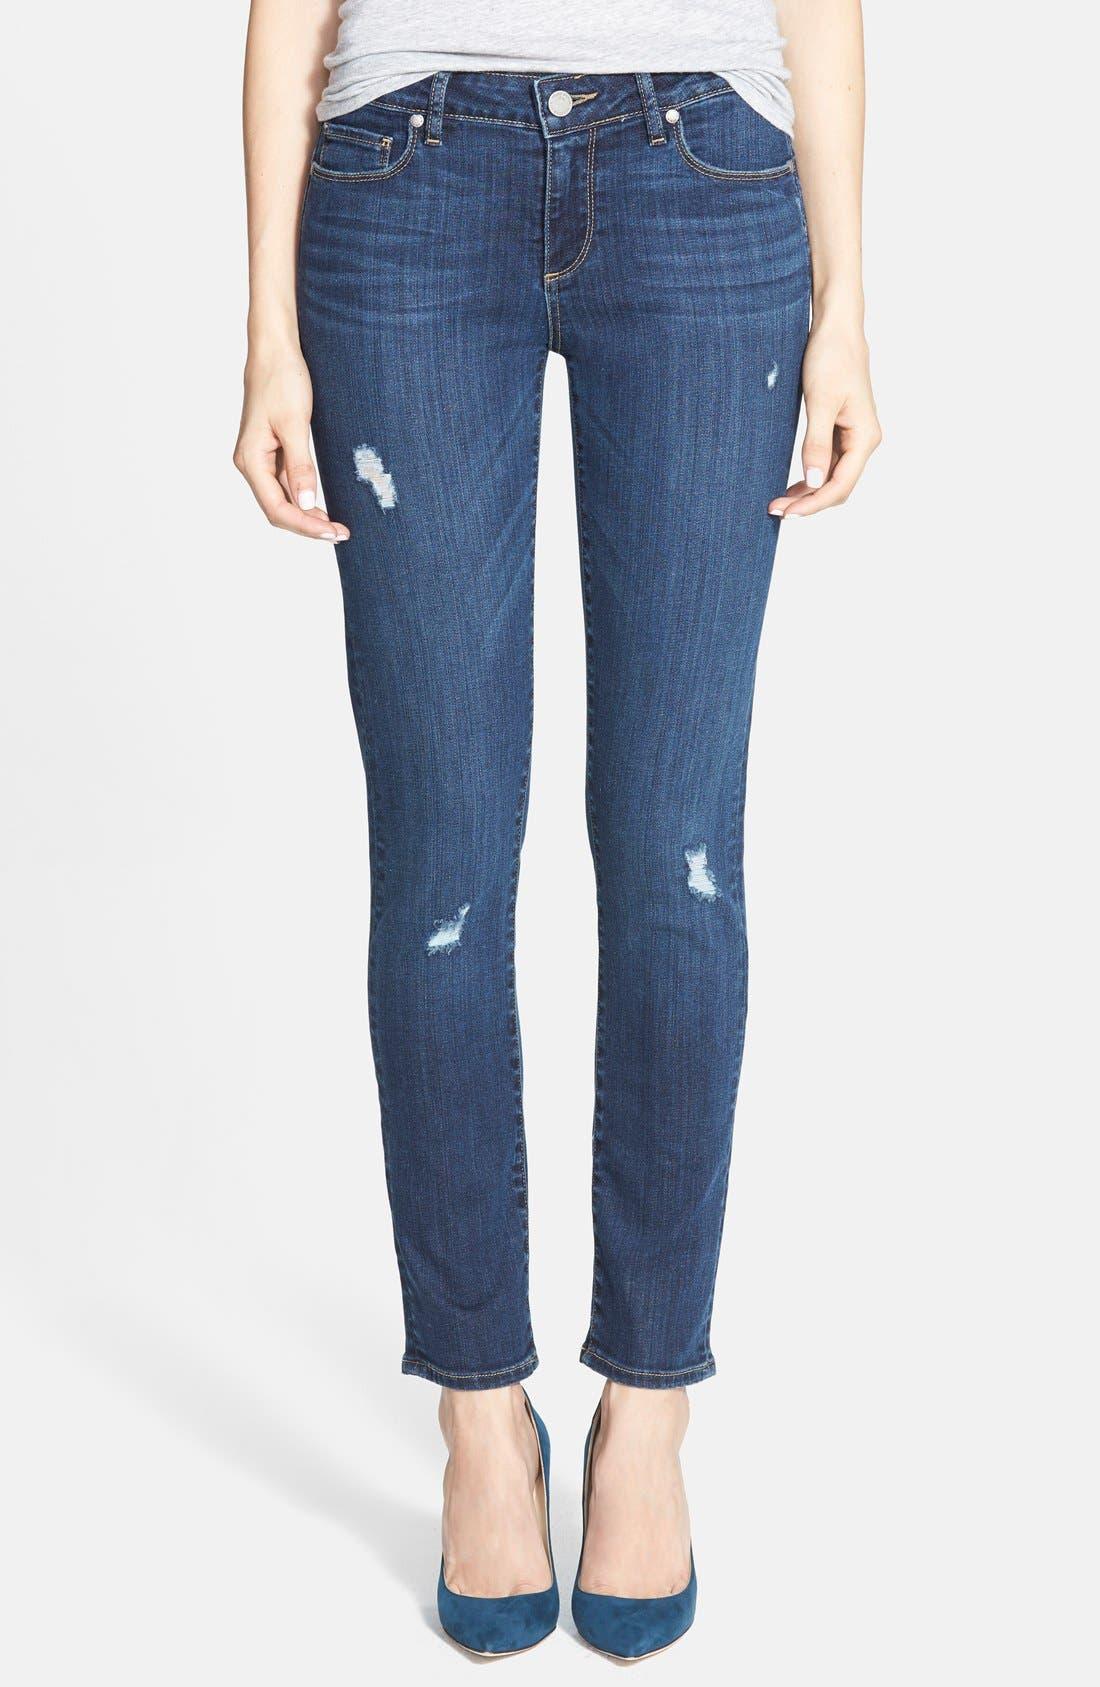 Alternate Image 1 Selected - Paige Denim 'Skyline' Ankle Peg Skinny Jeans (Lyric Deconstructed)